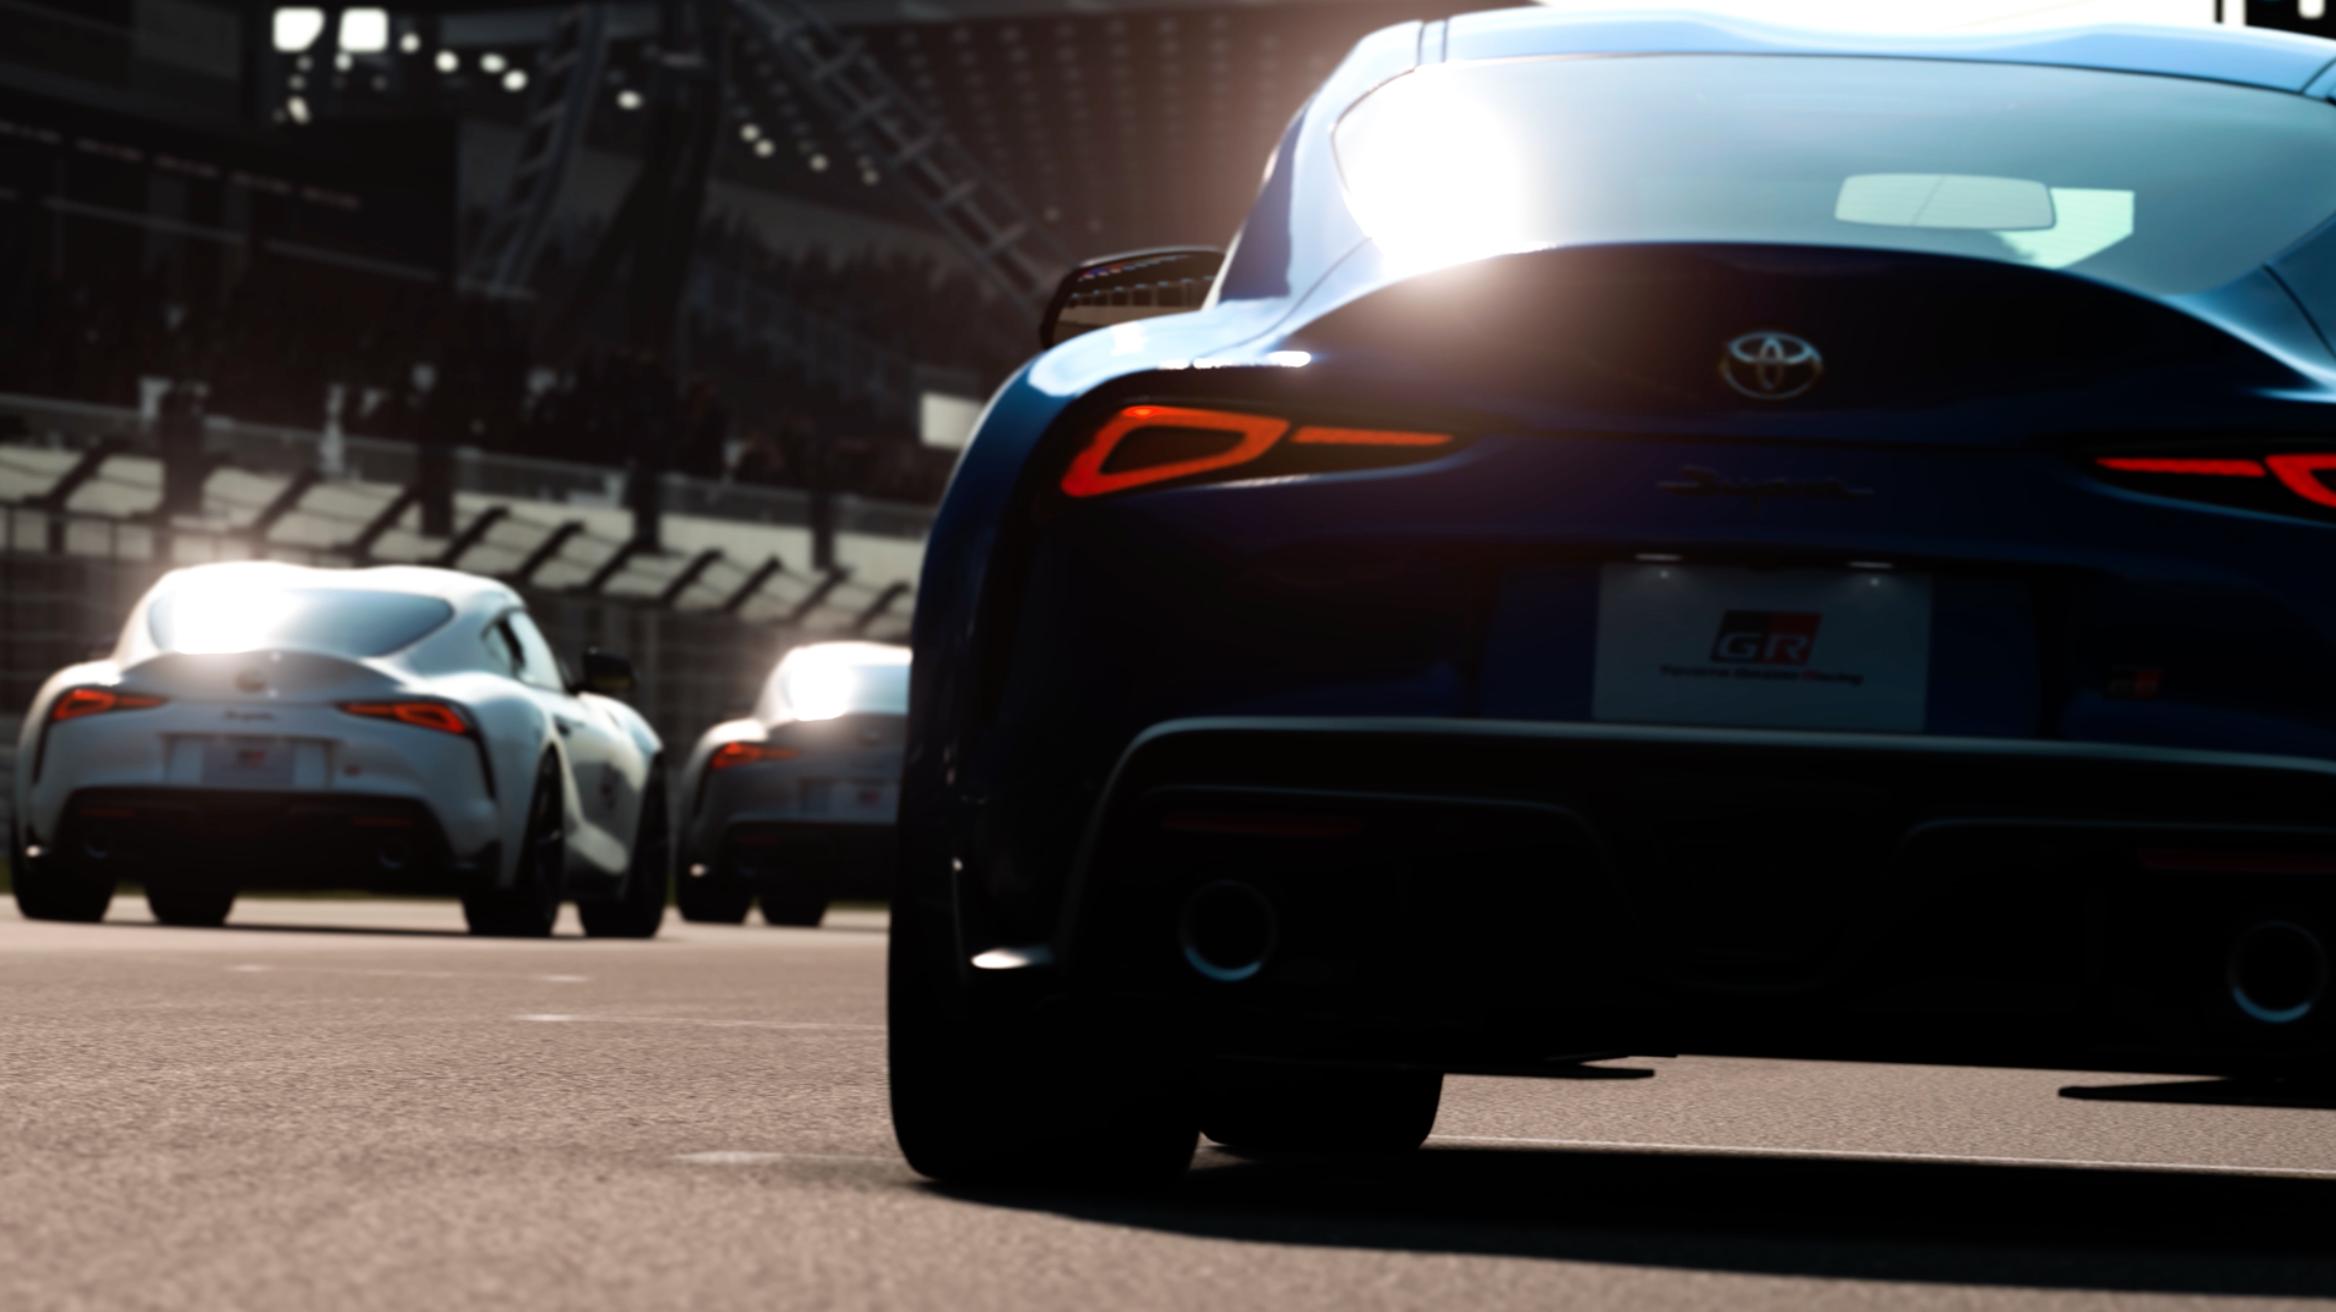 Bringing Real Excitement to Virtual Racing